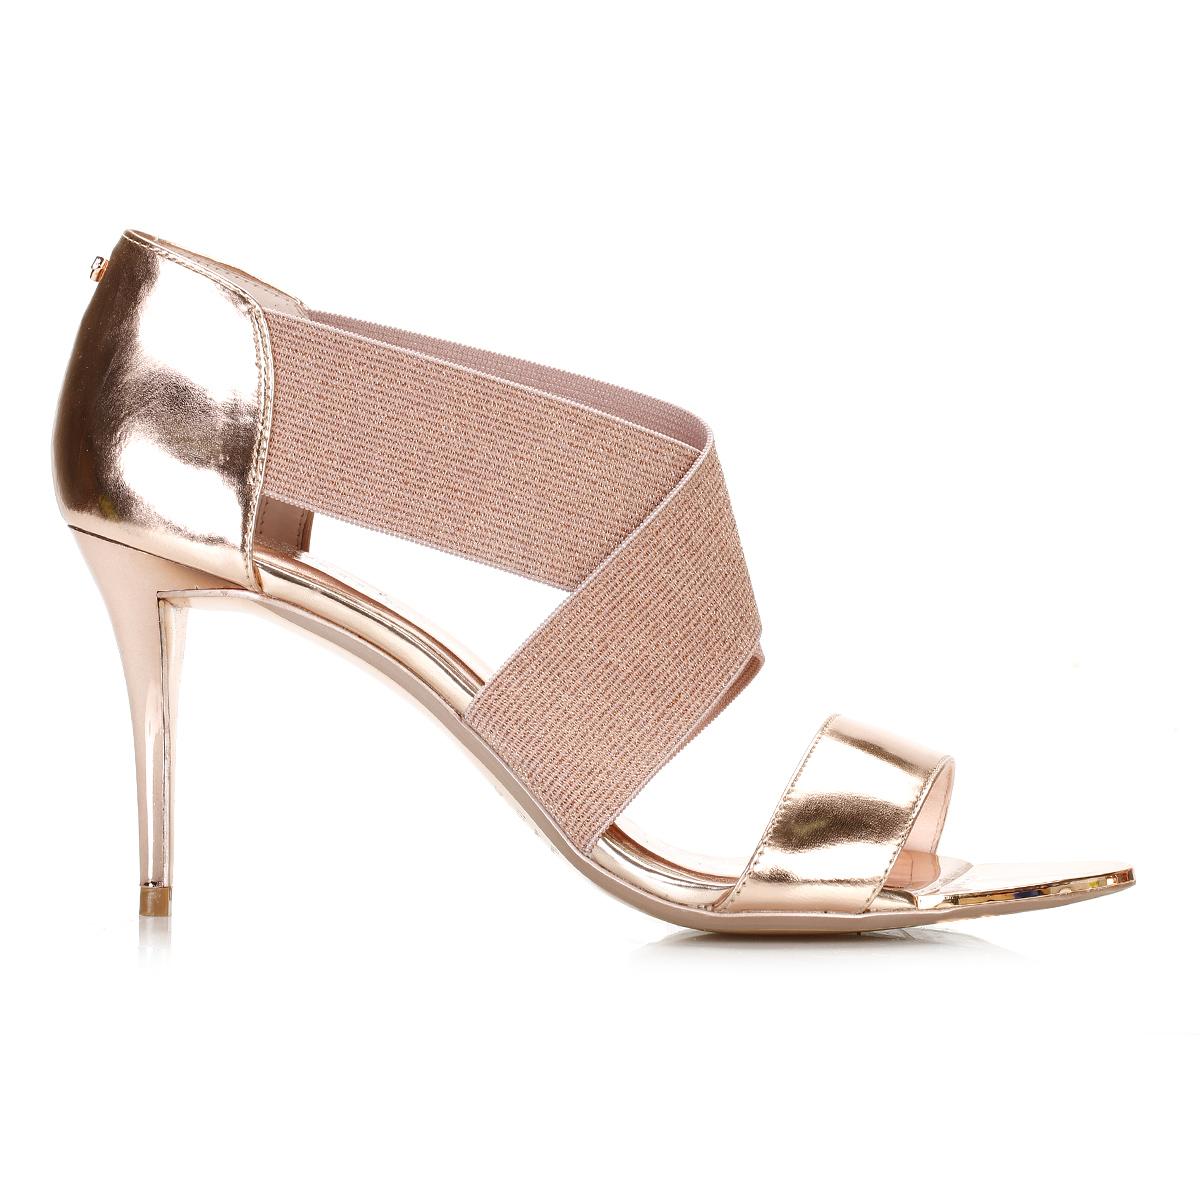 Cream Leather Court Shoes Uk